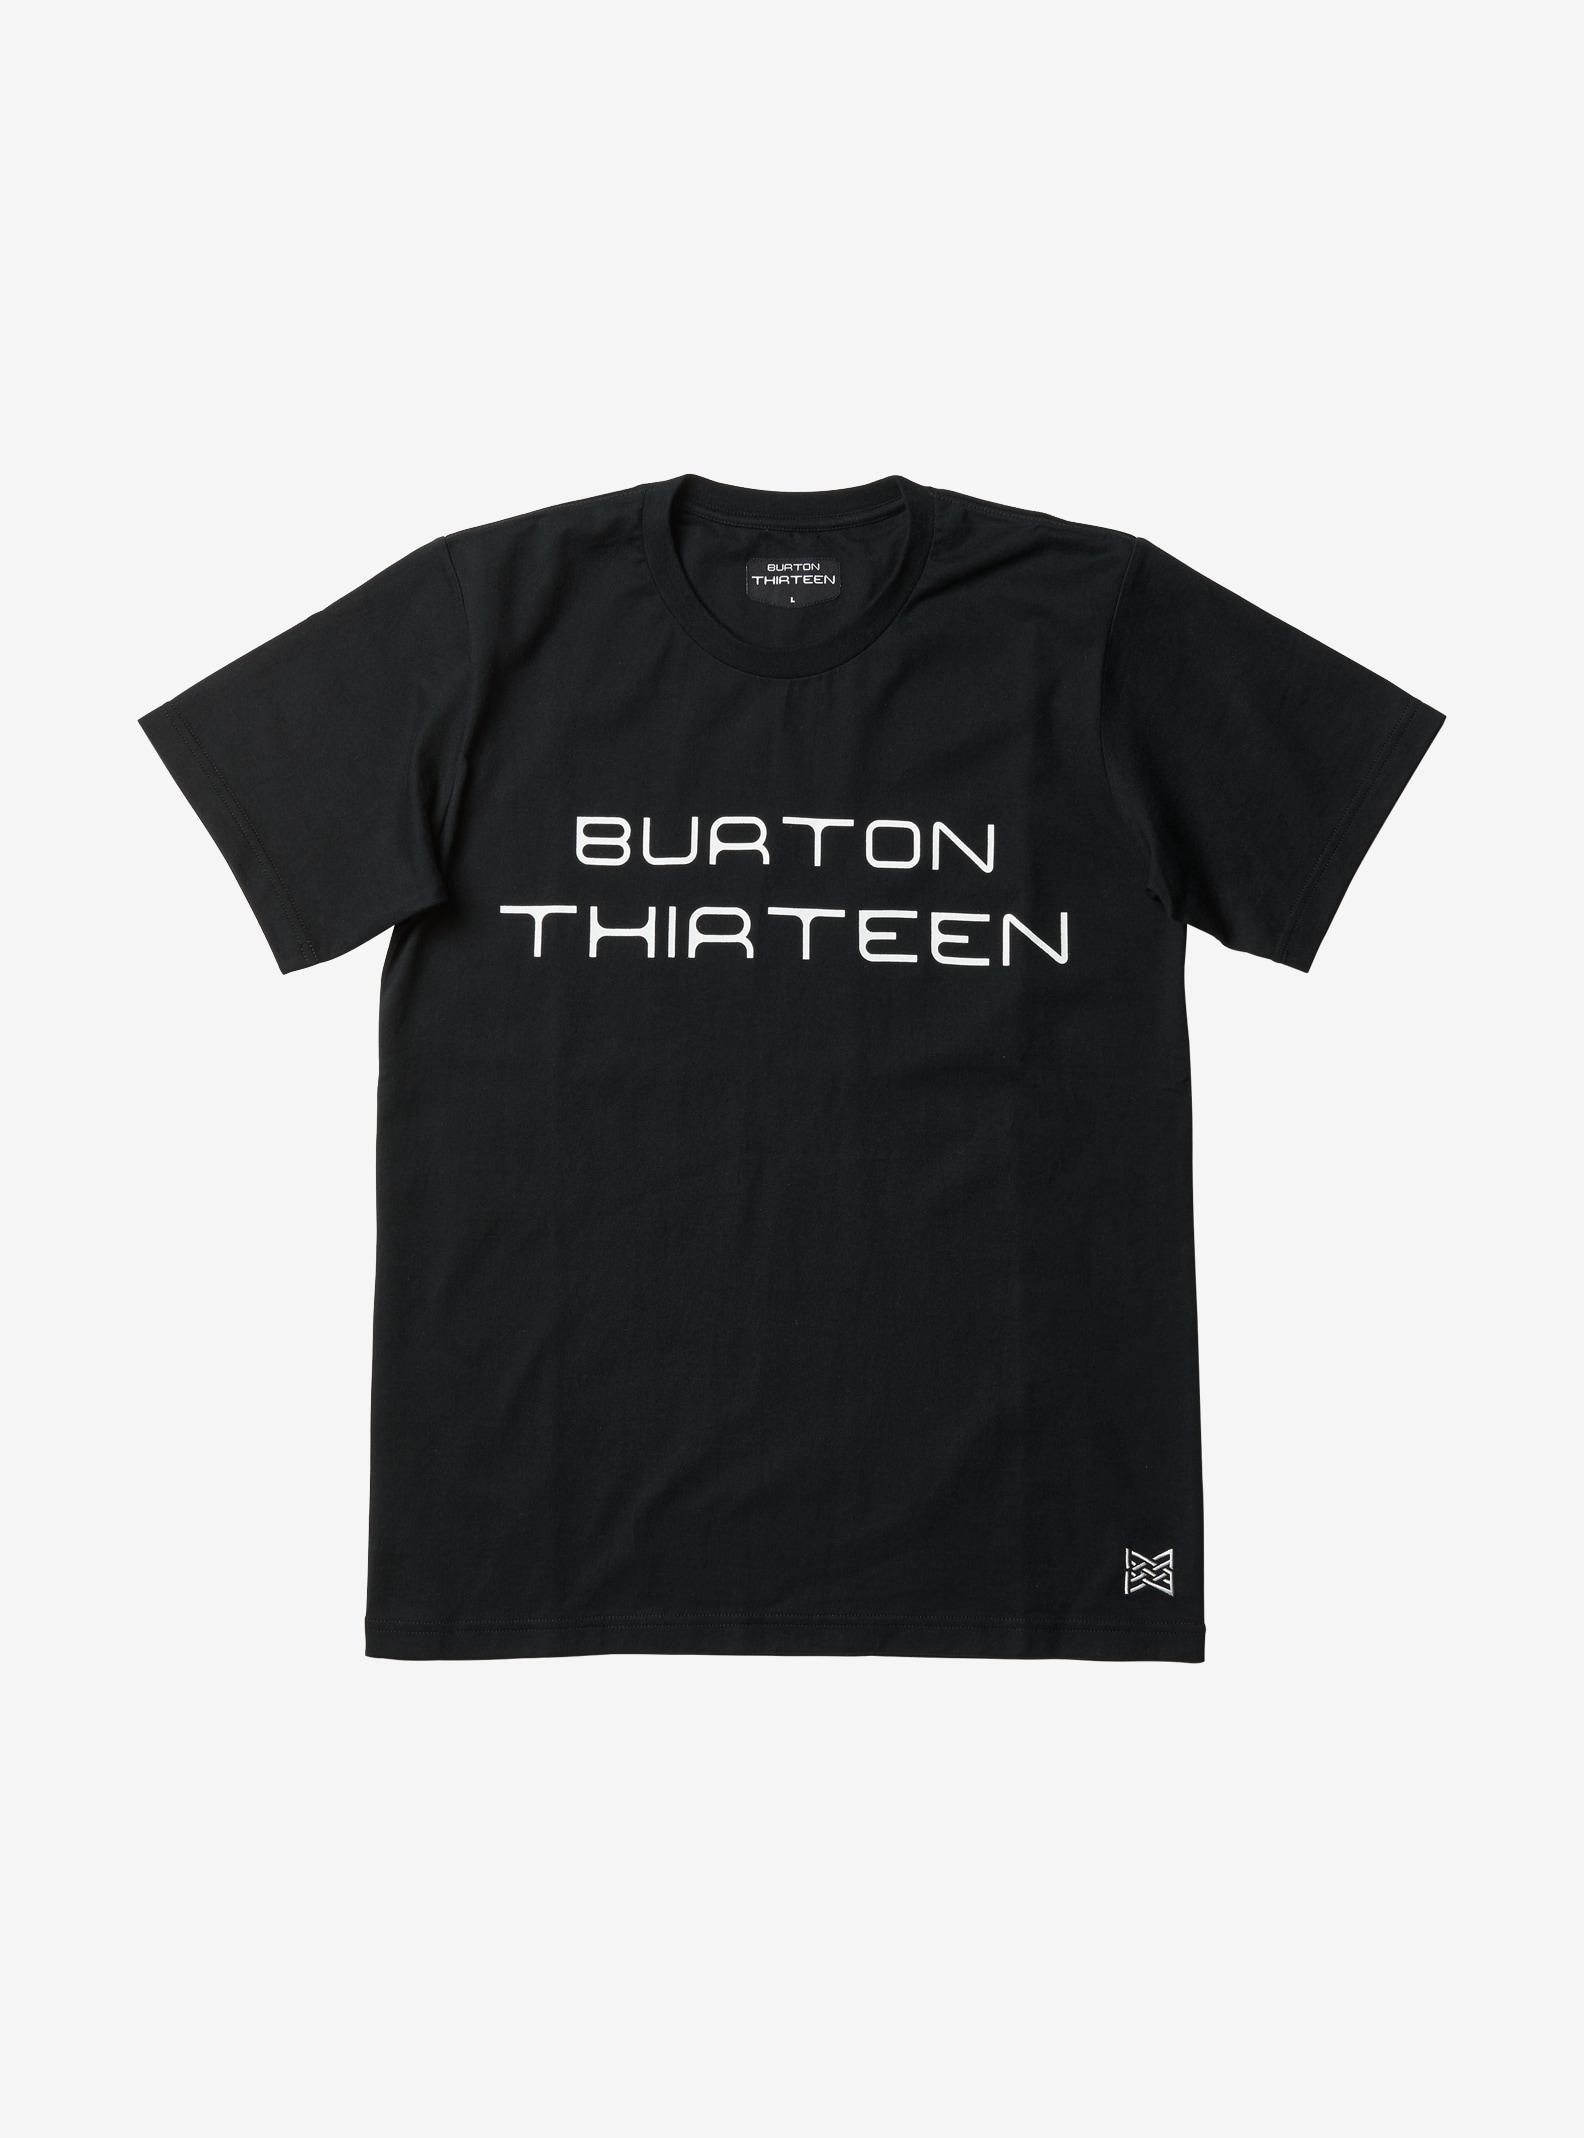 Burton Thirteen Thaumas Short Sleeve T Shirt shown in Black